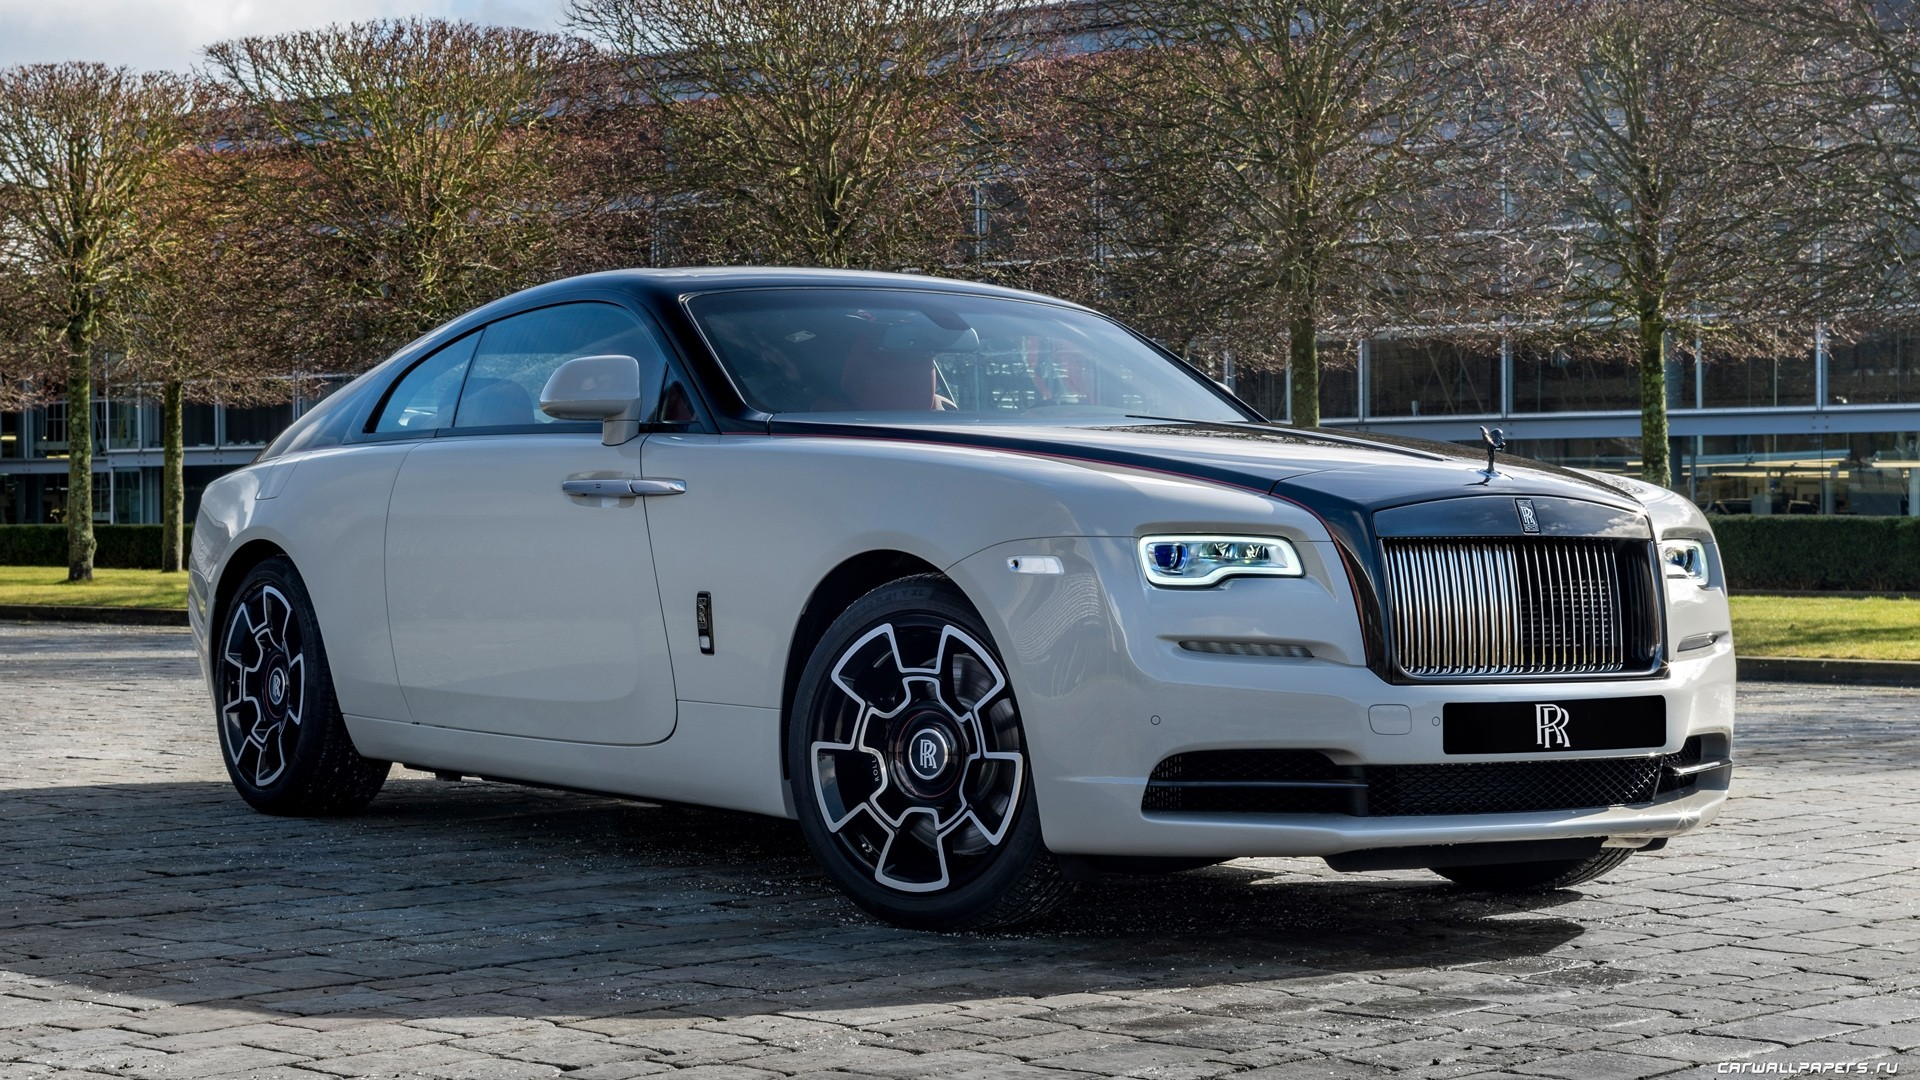 Rolls Royce Wraith PC Wallpaper HD